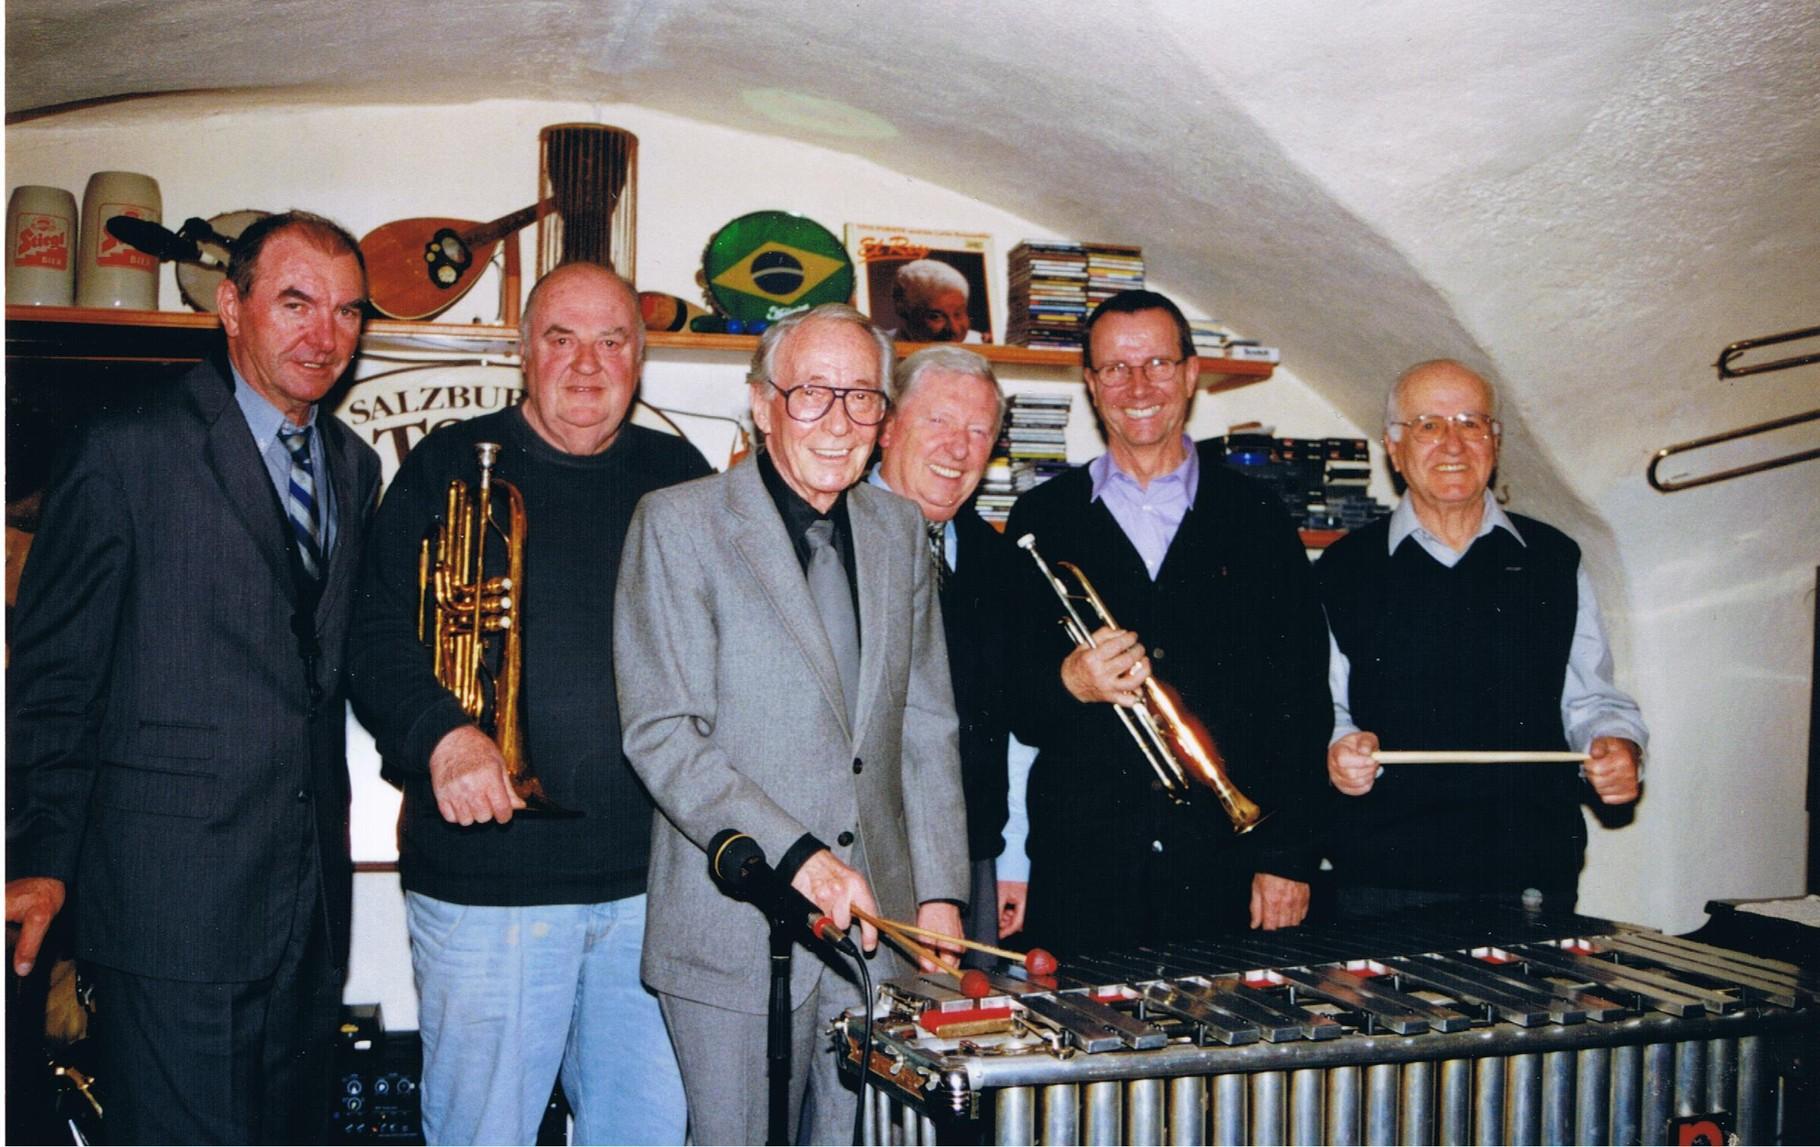 Salzburger Musikerlegenden im Altstadtkeller